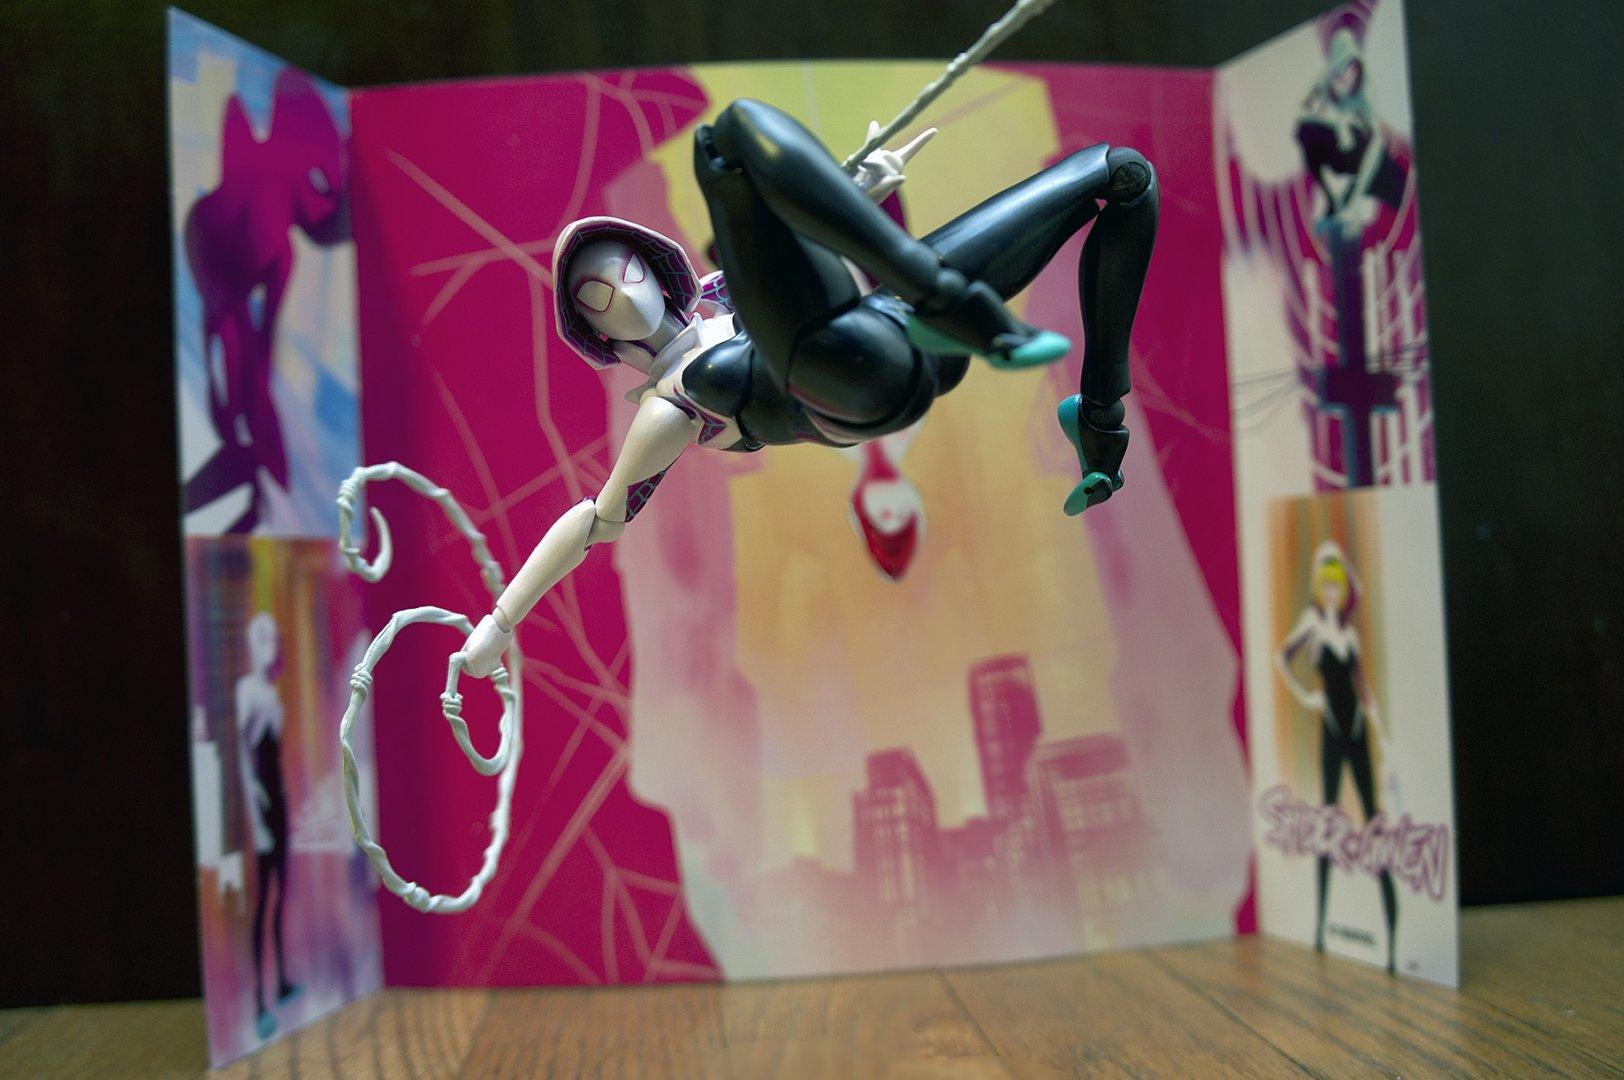 Marvel_Revo_Spider-Gwen_DSC06097.thumb.jpg.37585042e386245c517eaf48a1571bbc.jpg